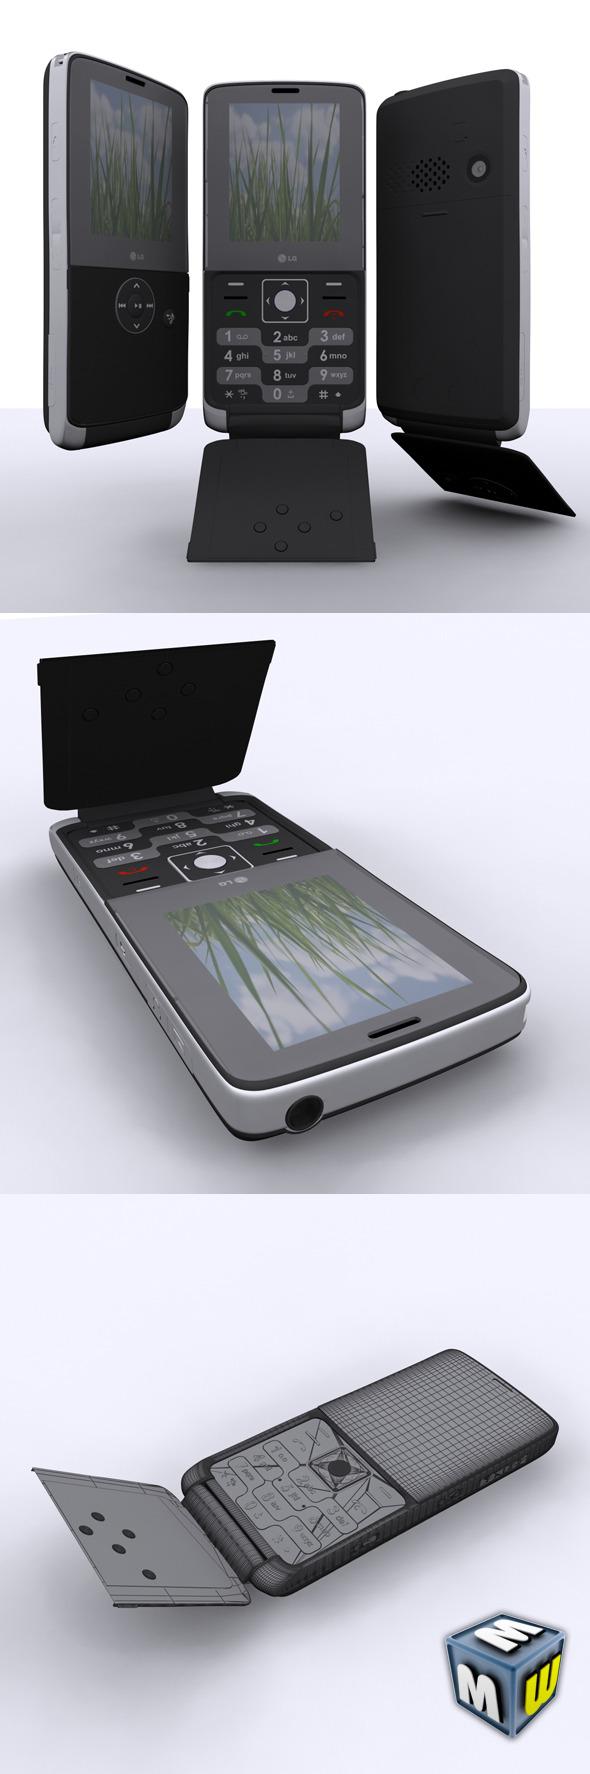 LG KM380 Max 2010 - 3DOcean Item for Sale